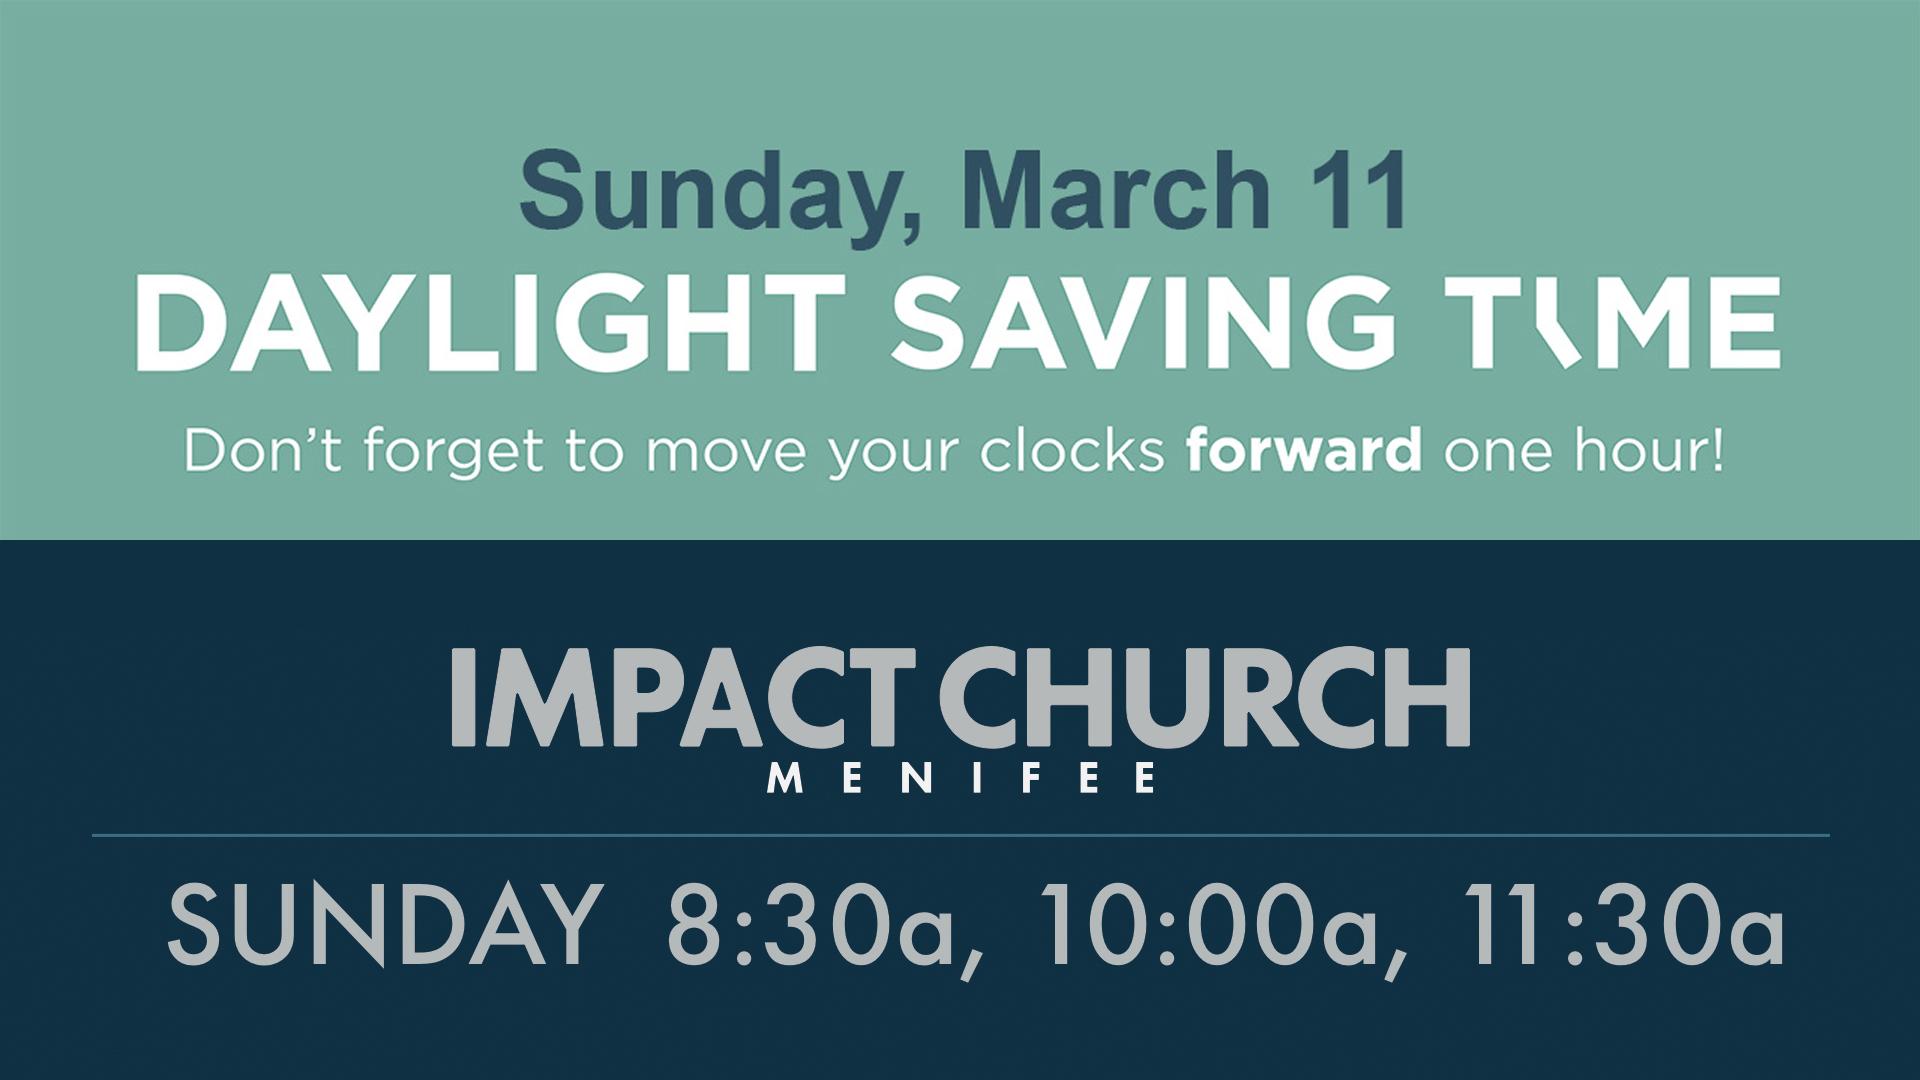 2018-03 Daylight Saving and New Service Times.jpg